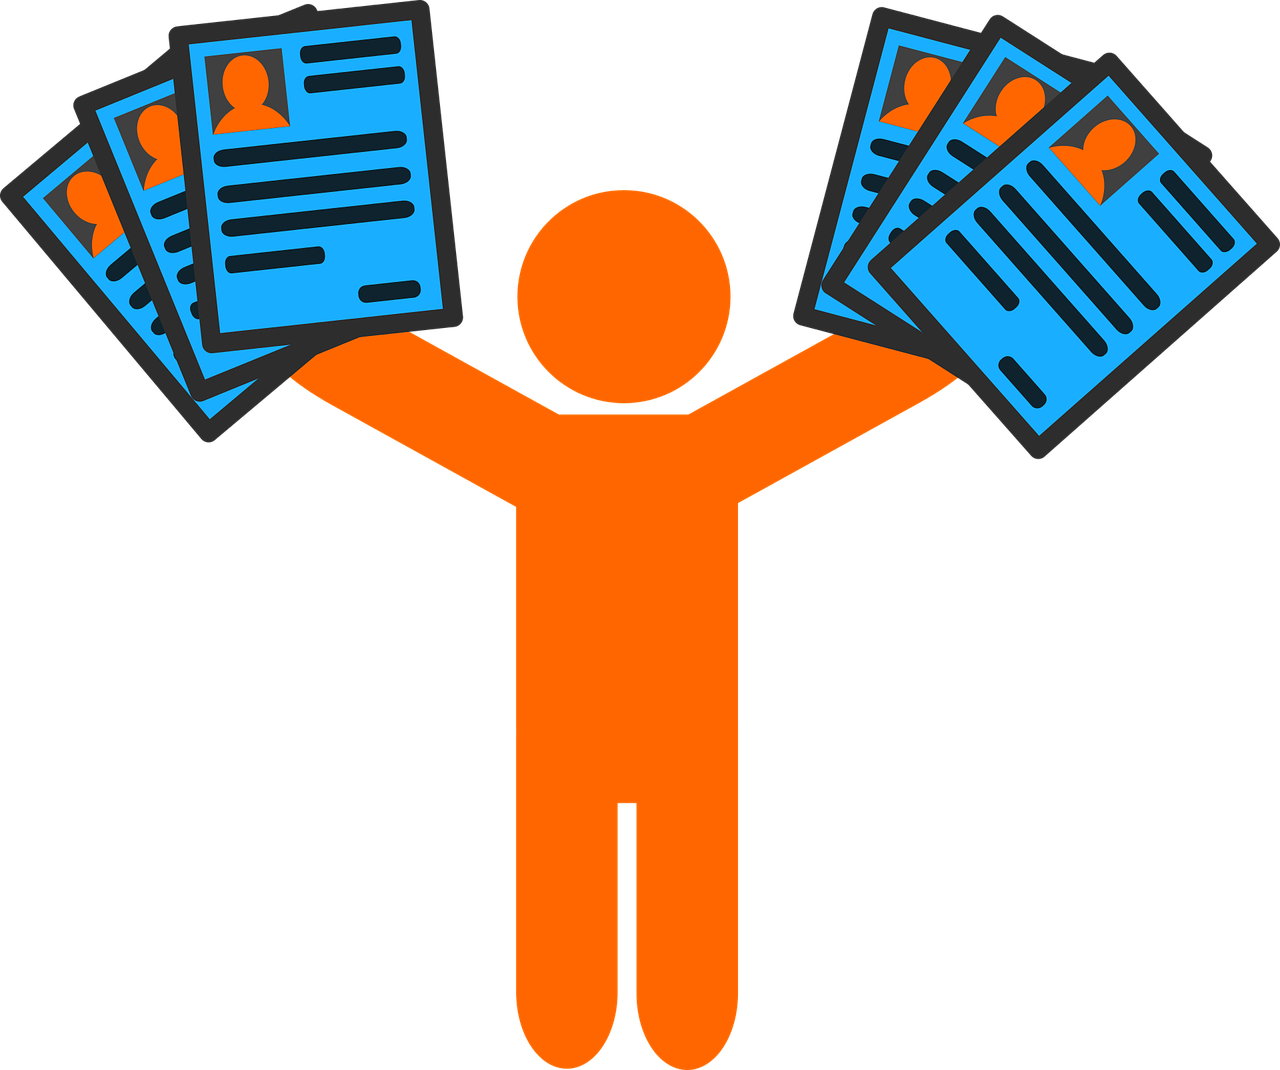 MonigoteCV  Cómo redactar un curriculum vitae para encontrar trabajo MonigoteCV